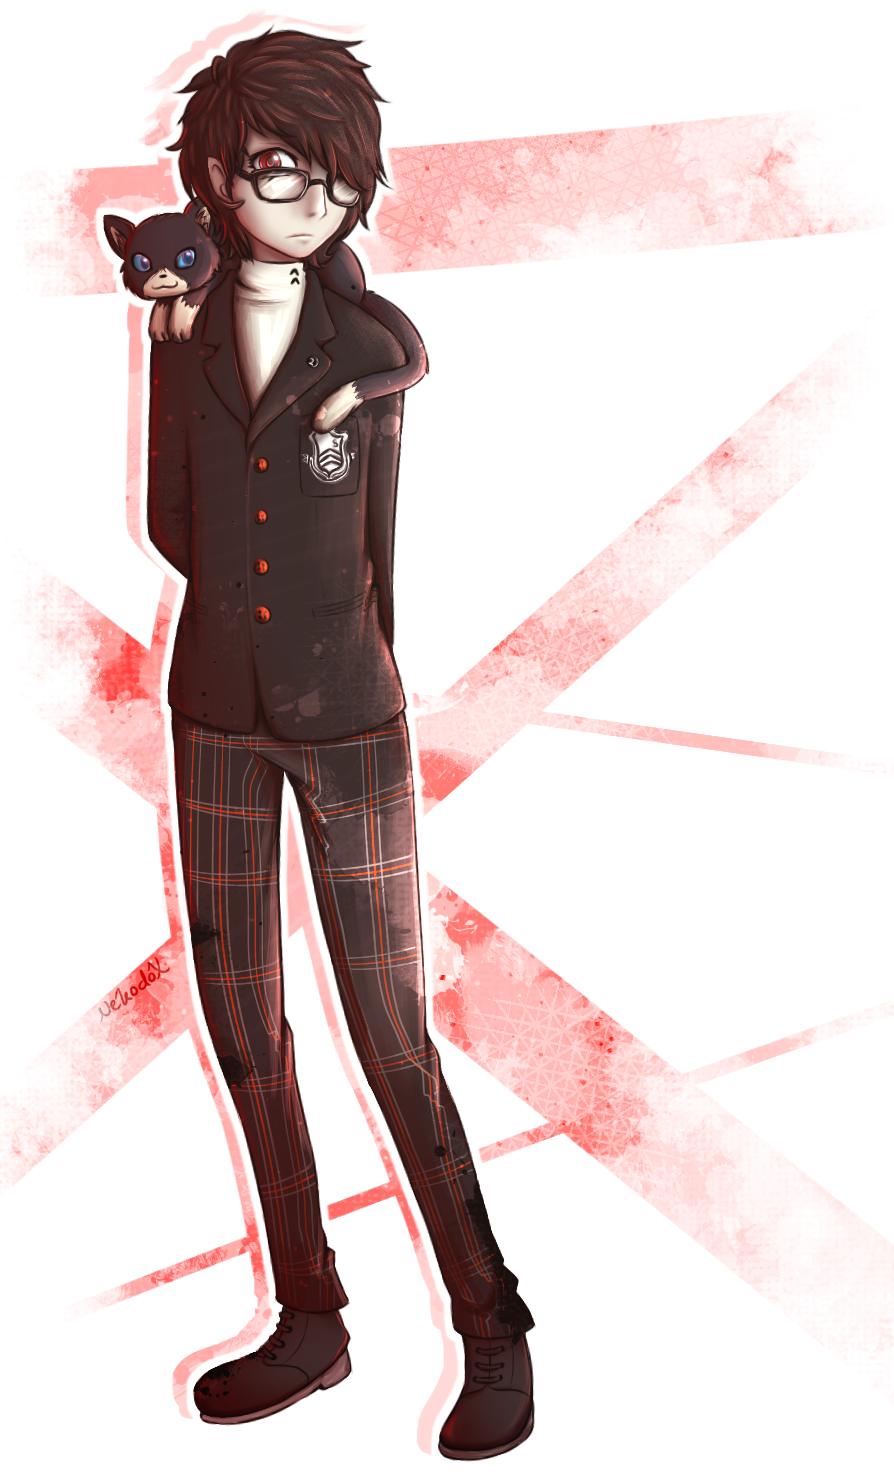 Persona 5 - Protagonist by Nekodox